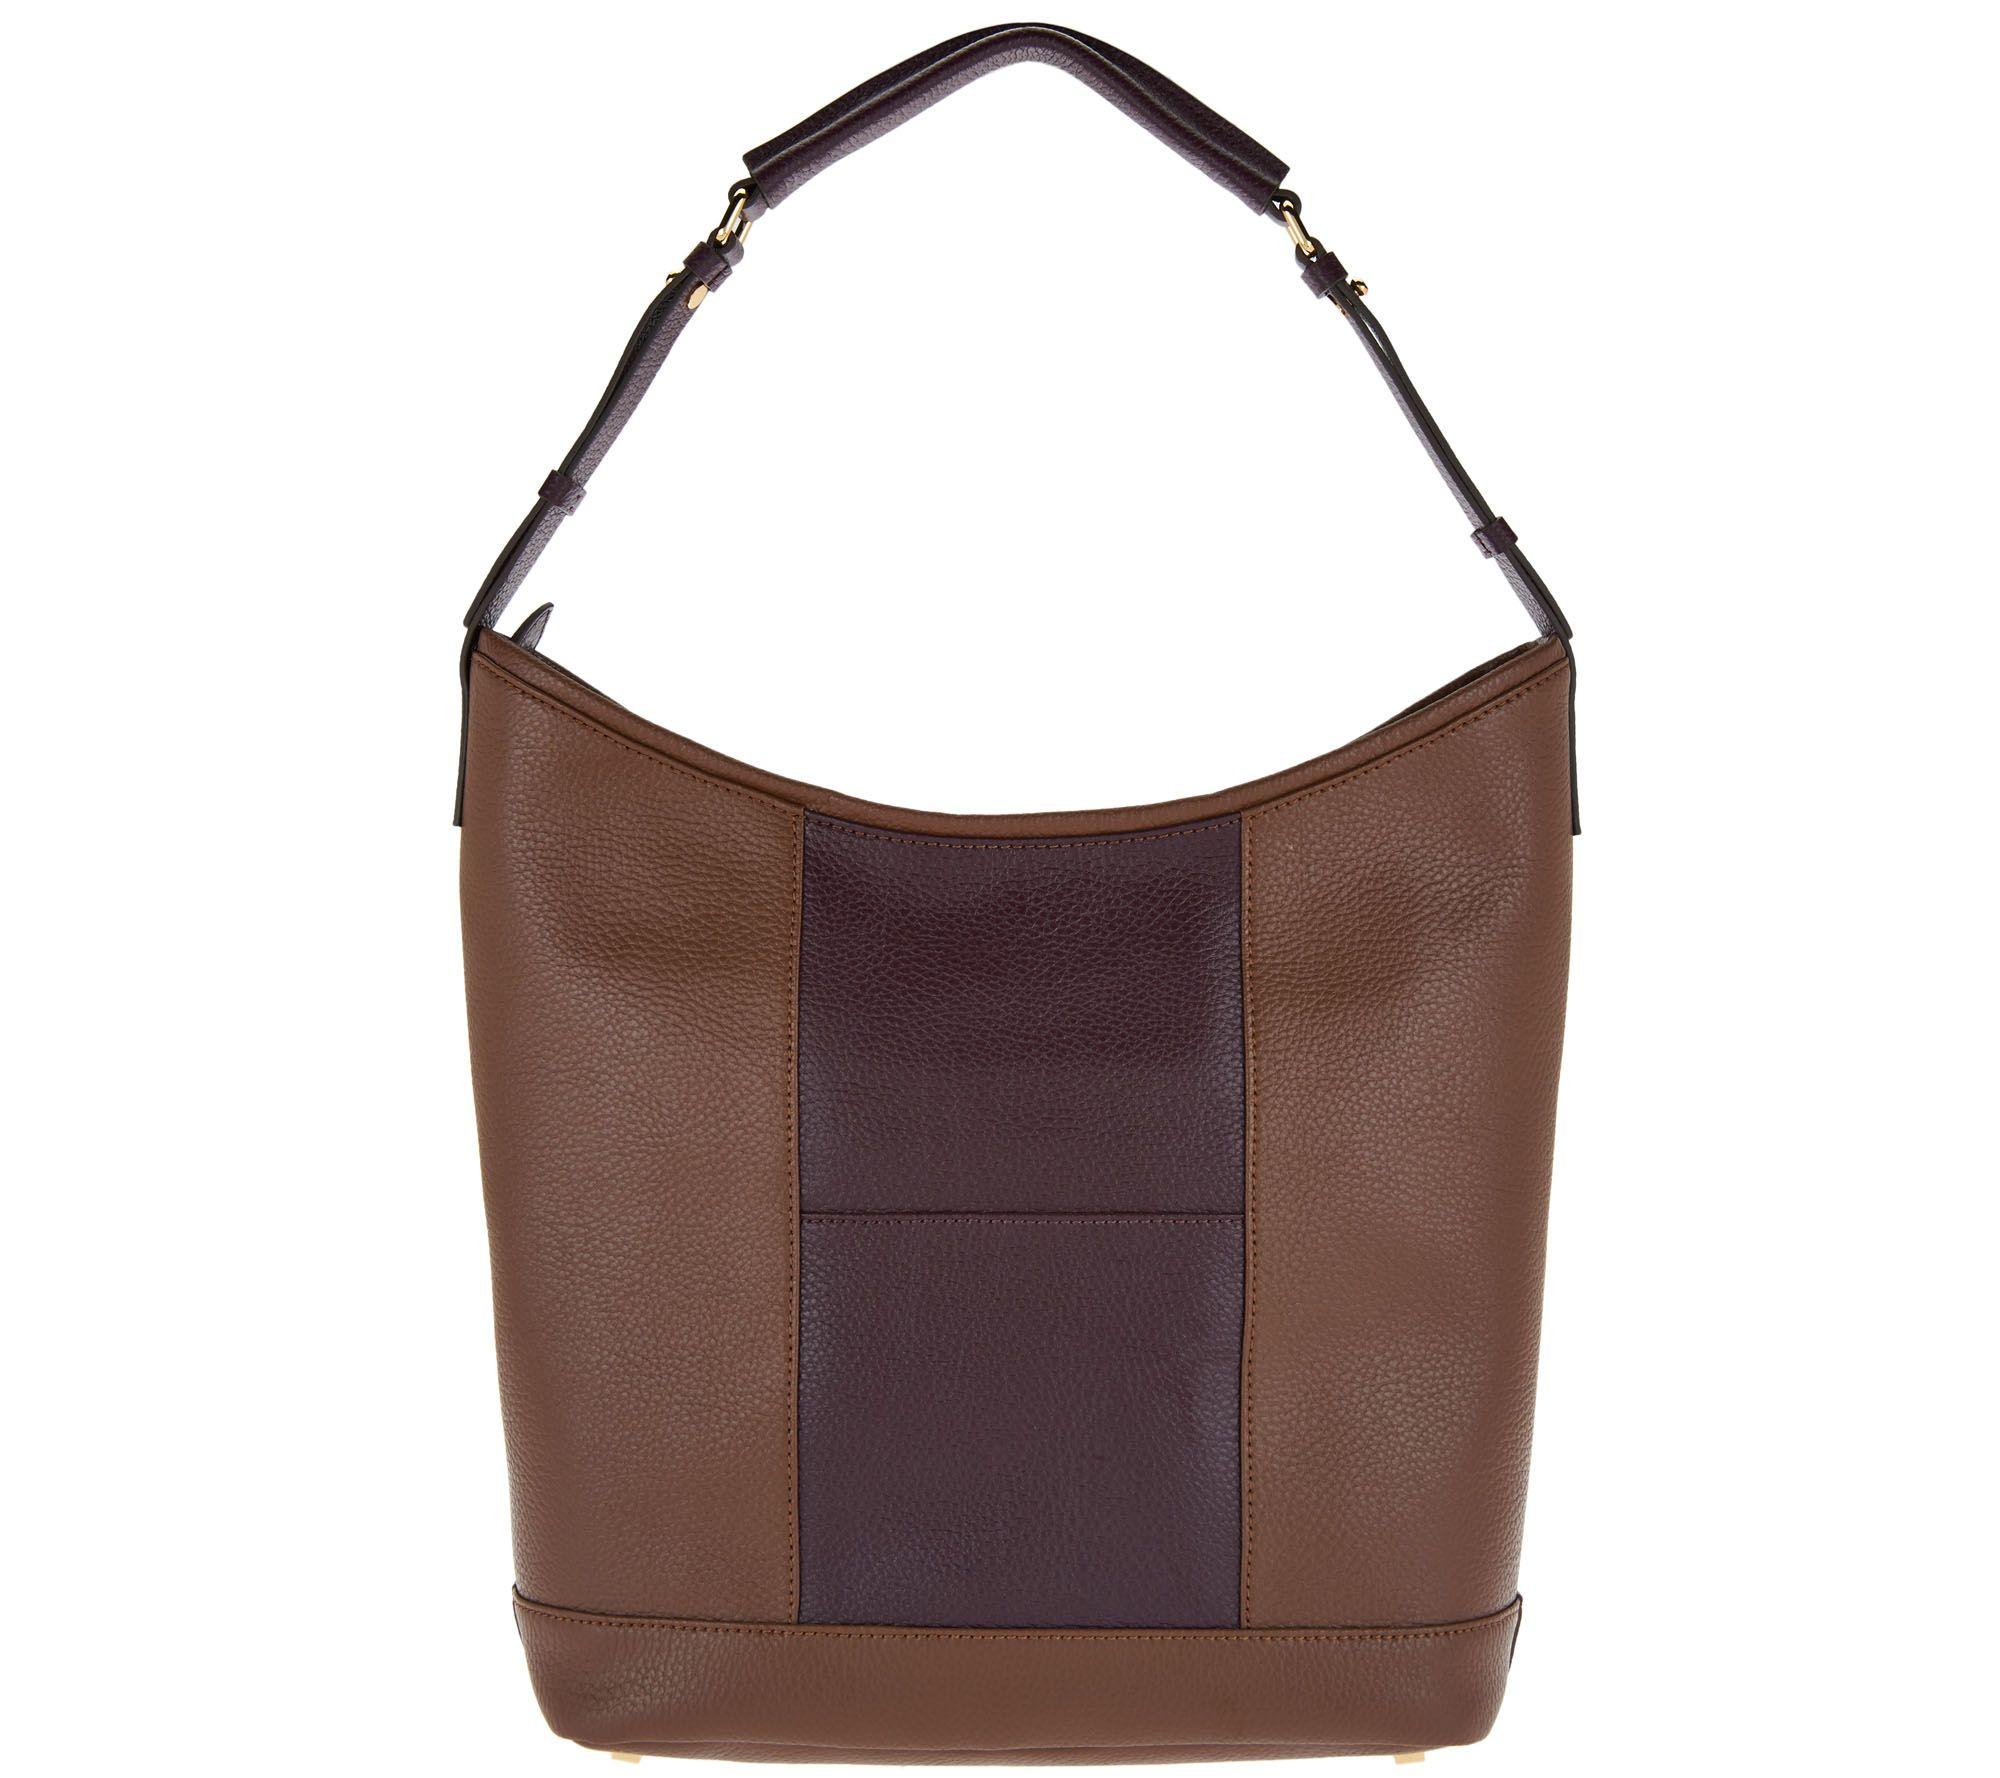 e52da35496 H by Halston Pebble Leather Color-Block Hobo Handbag - Page 1 — QVC.com